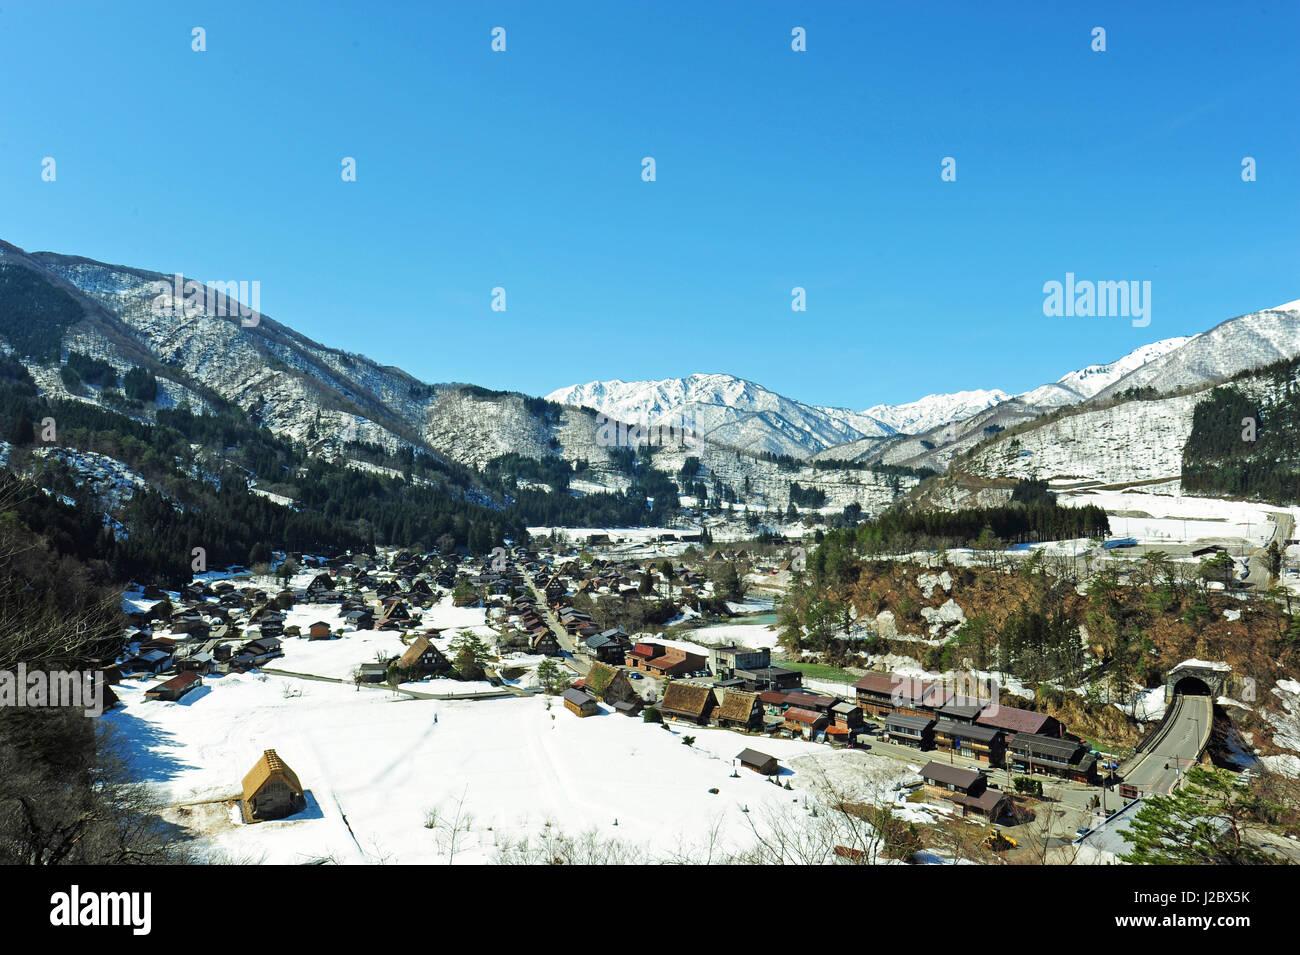 Japan. Gifu Prefecture, Shirakawa-go village under the snow - Stock Image